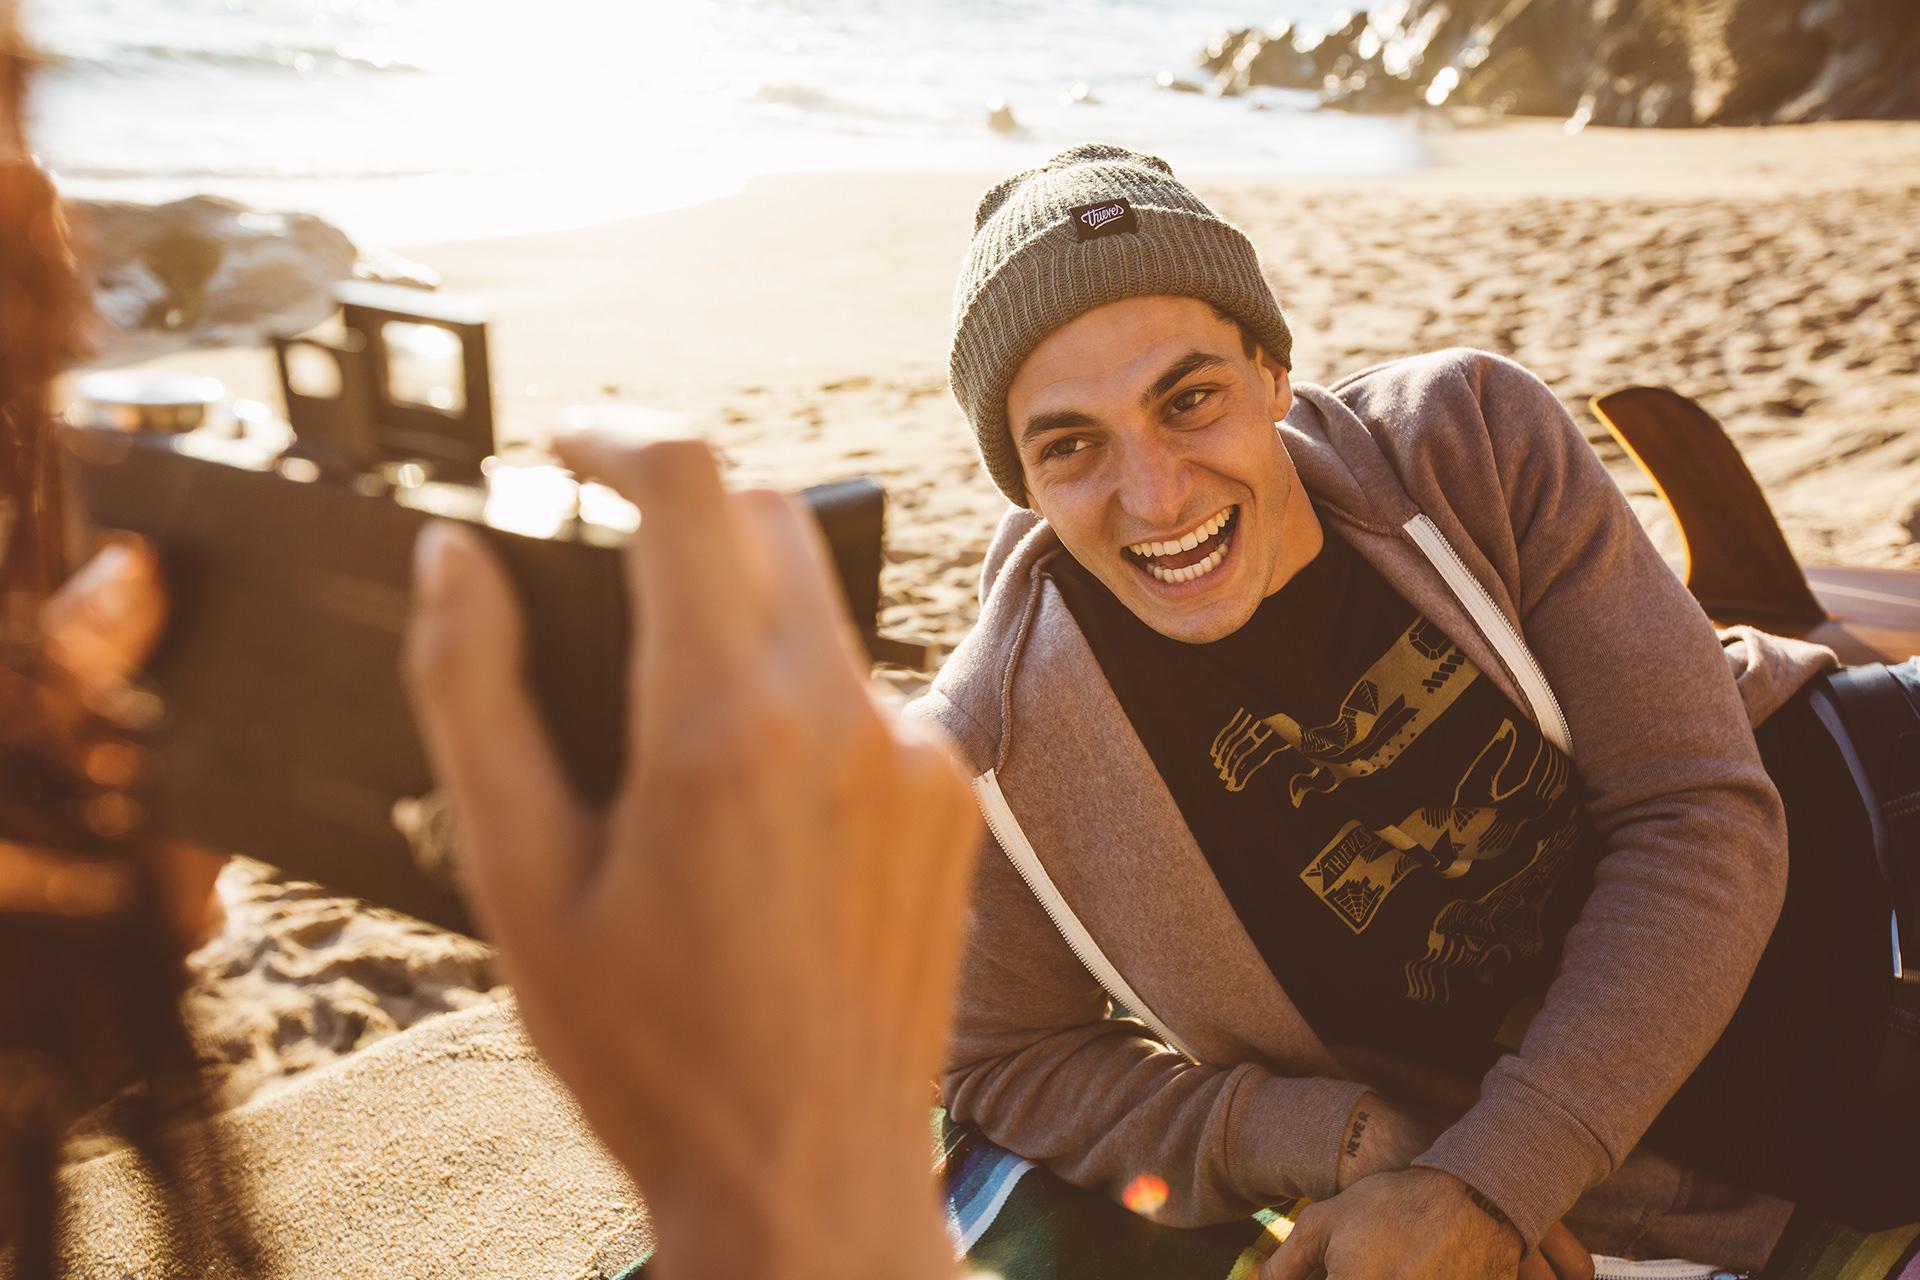 fotografieren-mann-analog-strand-lachen